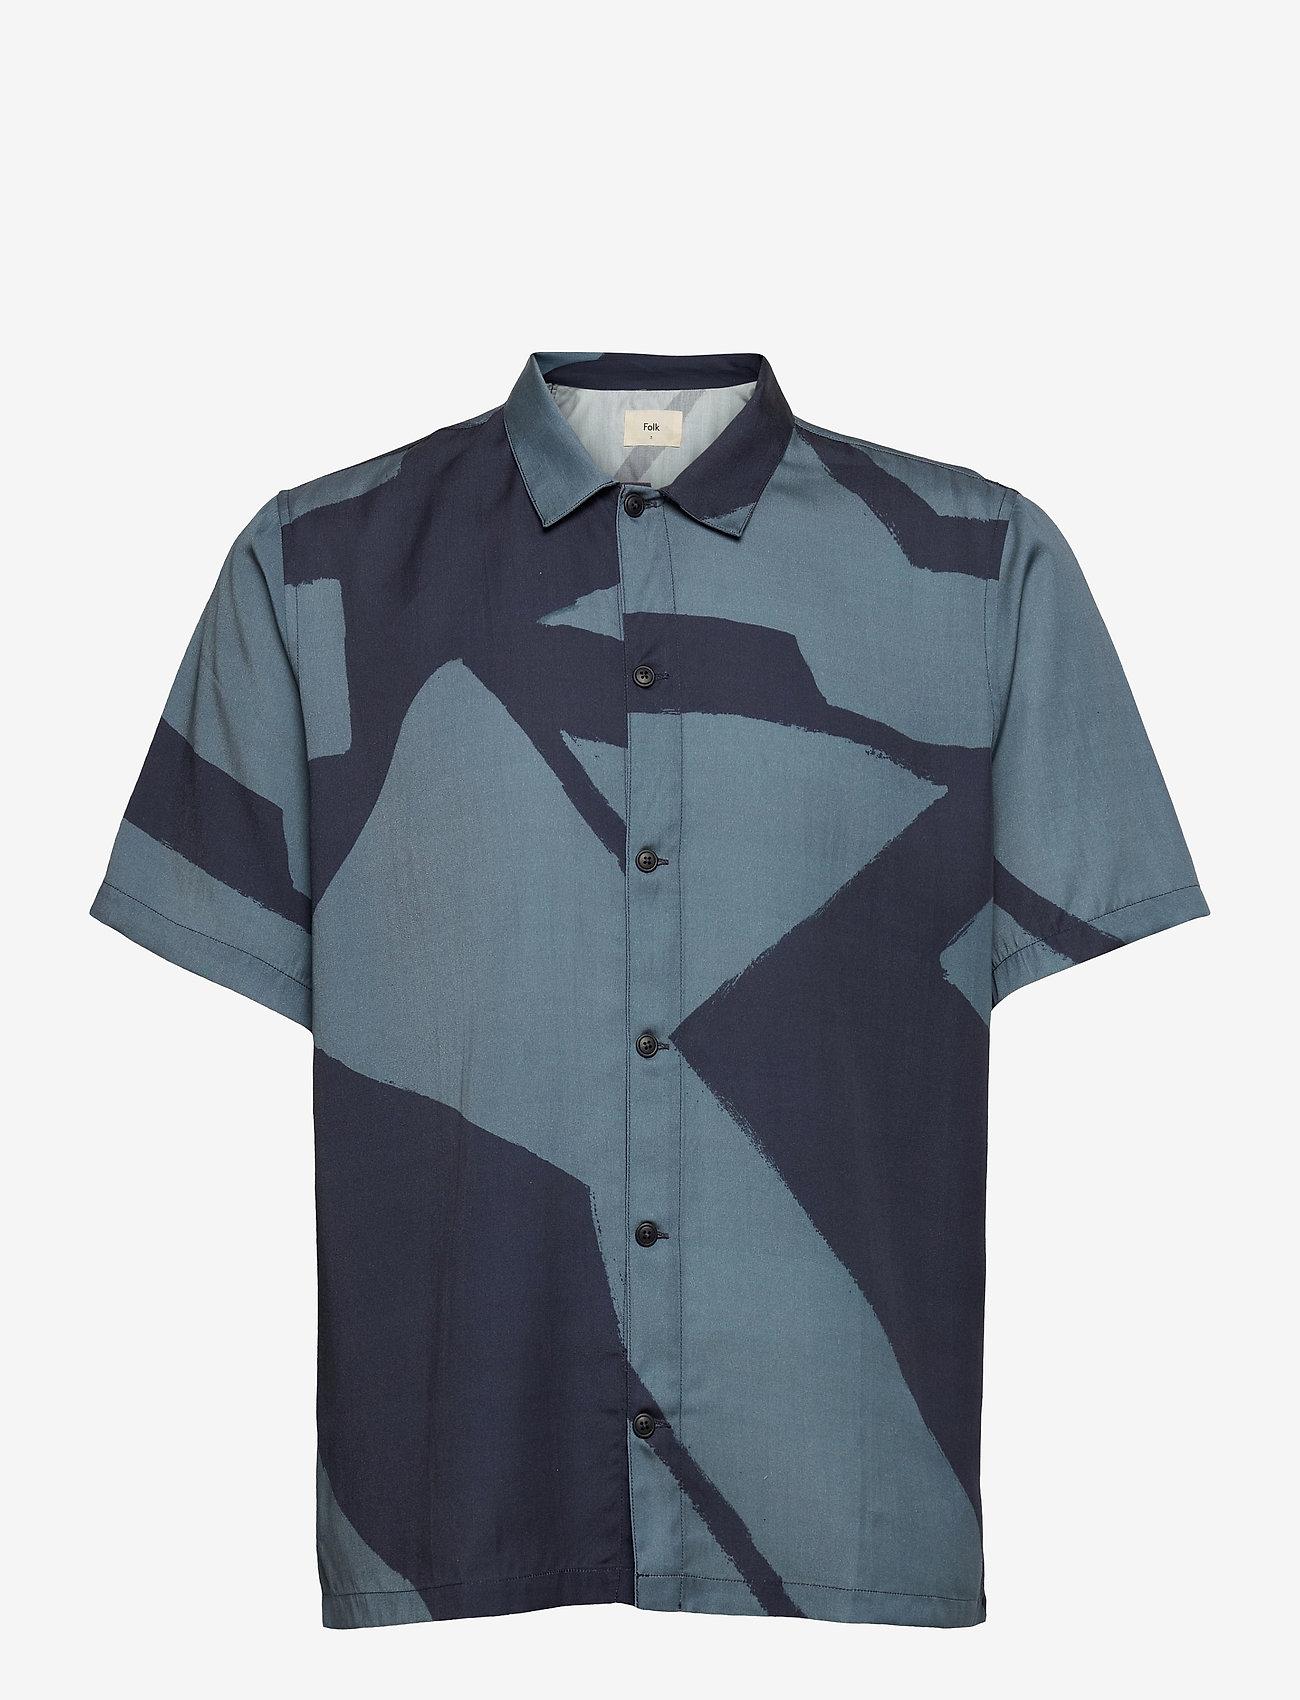 Folk - GABE SHIRT - chemises à manches courtes - border print navy - 0